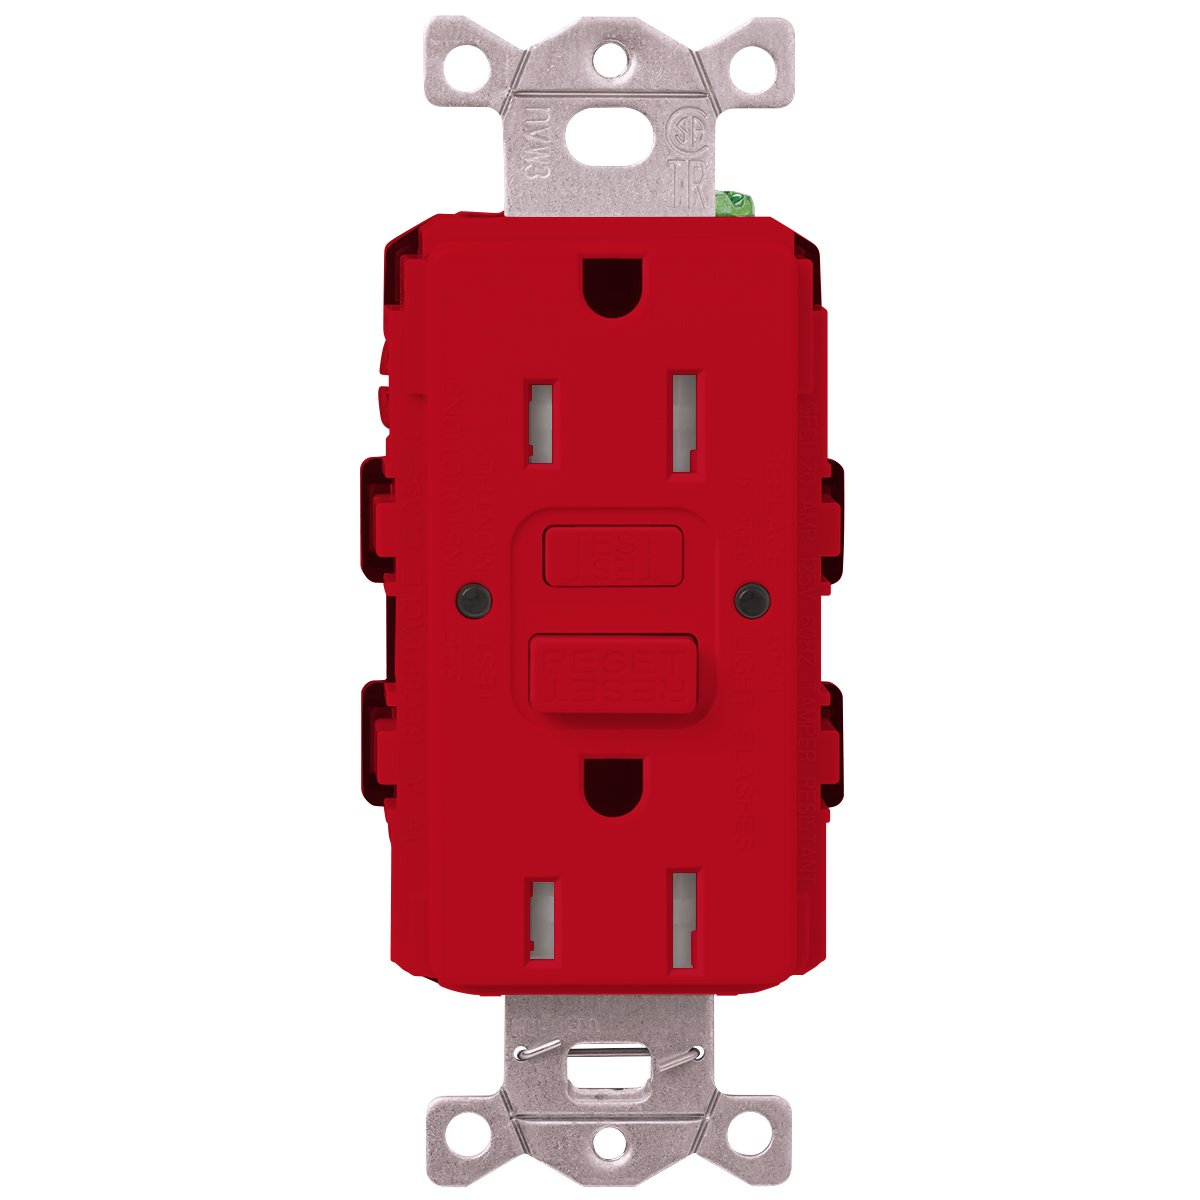 Lutron SCR-15-GFST-MS Scr-15-Gfst-St Claro Satin Colors 15-Amp Self-Testing Receptacle Mocha Stone